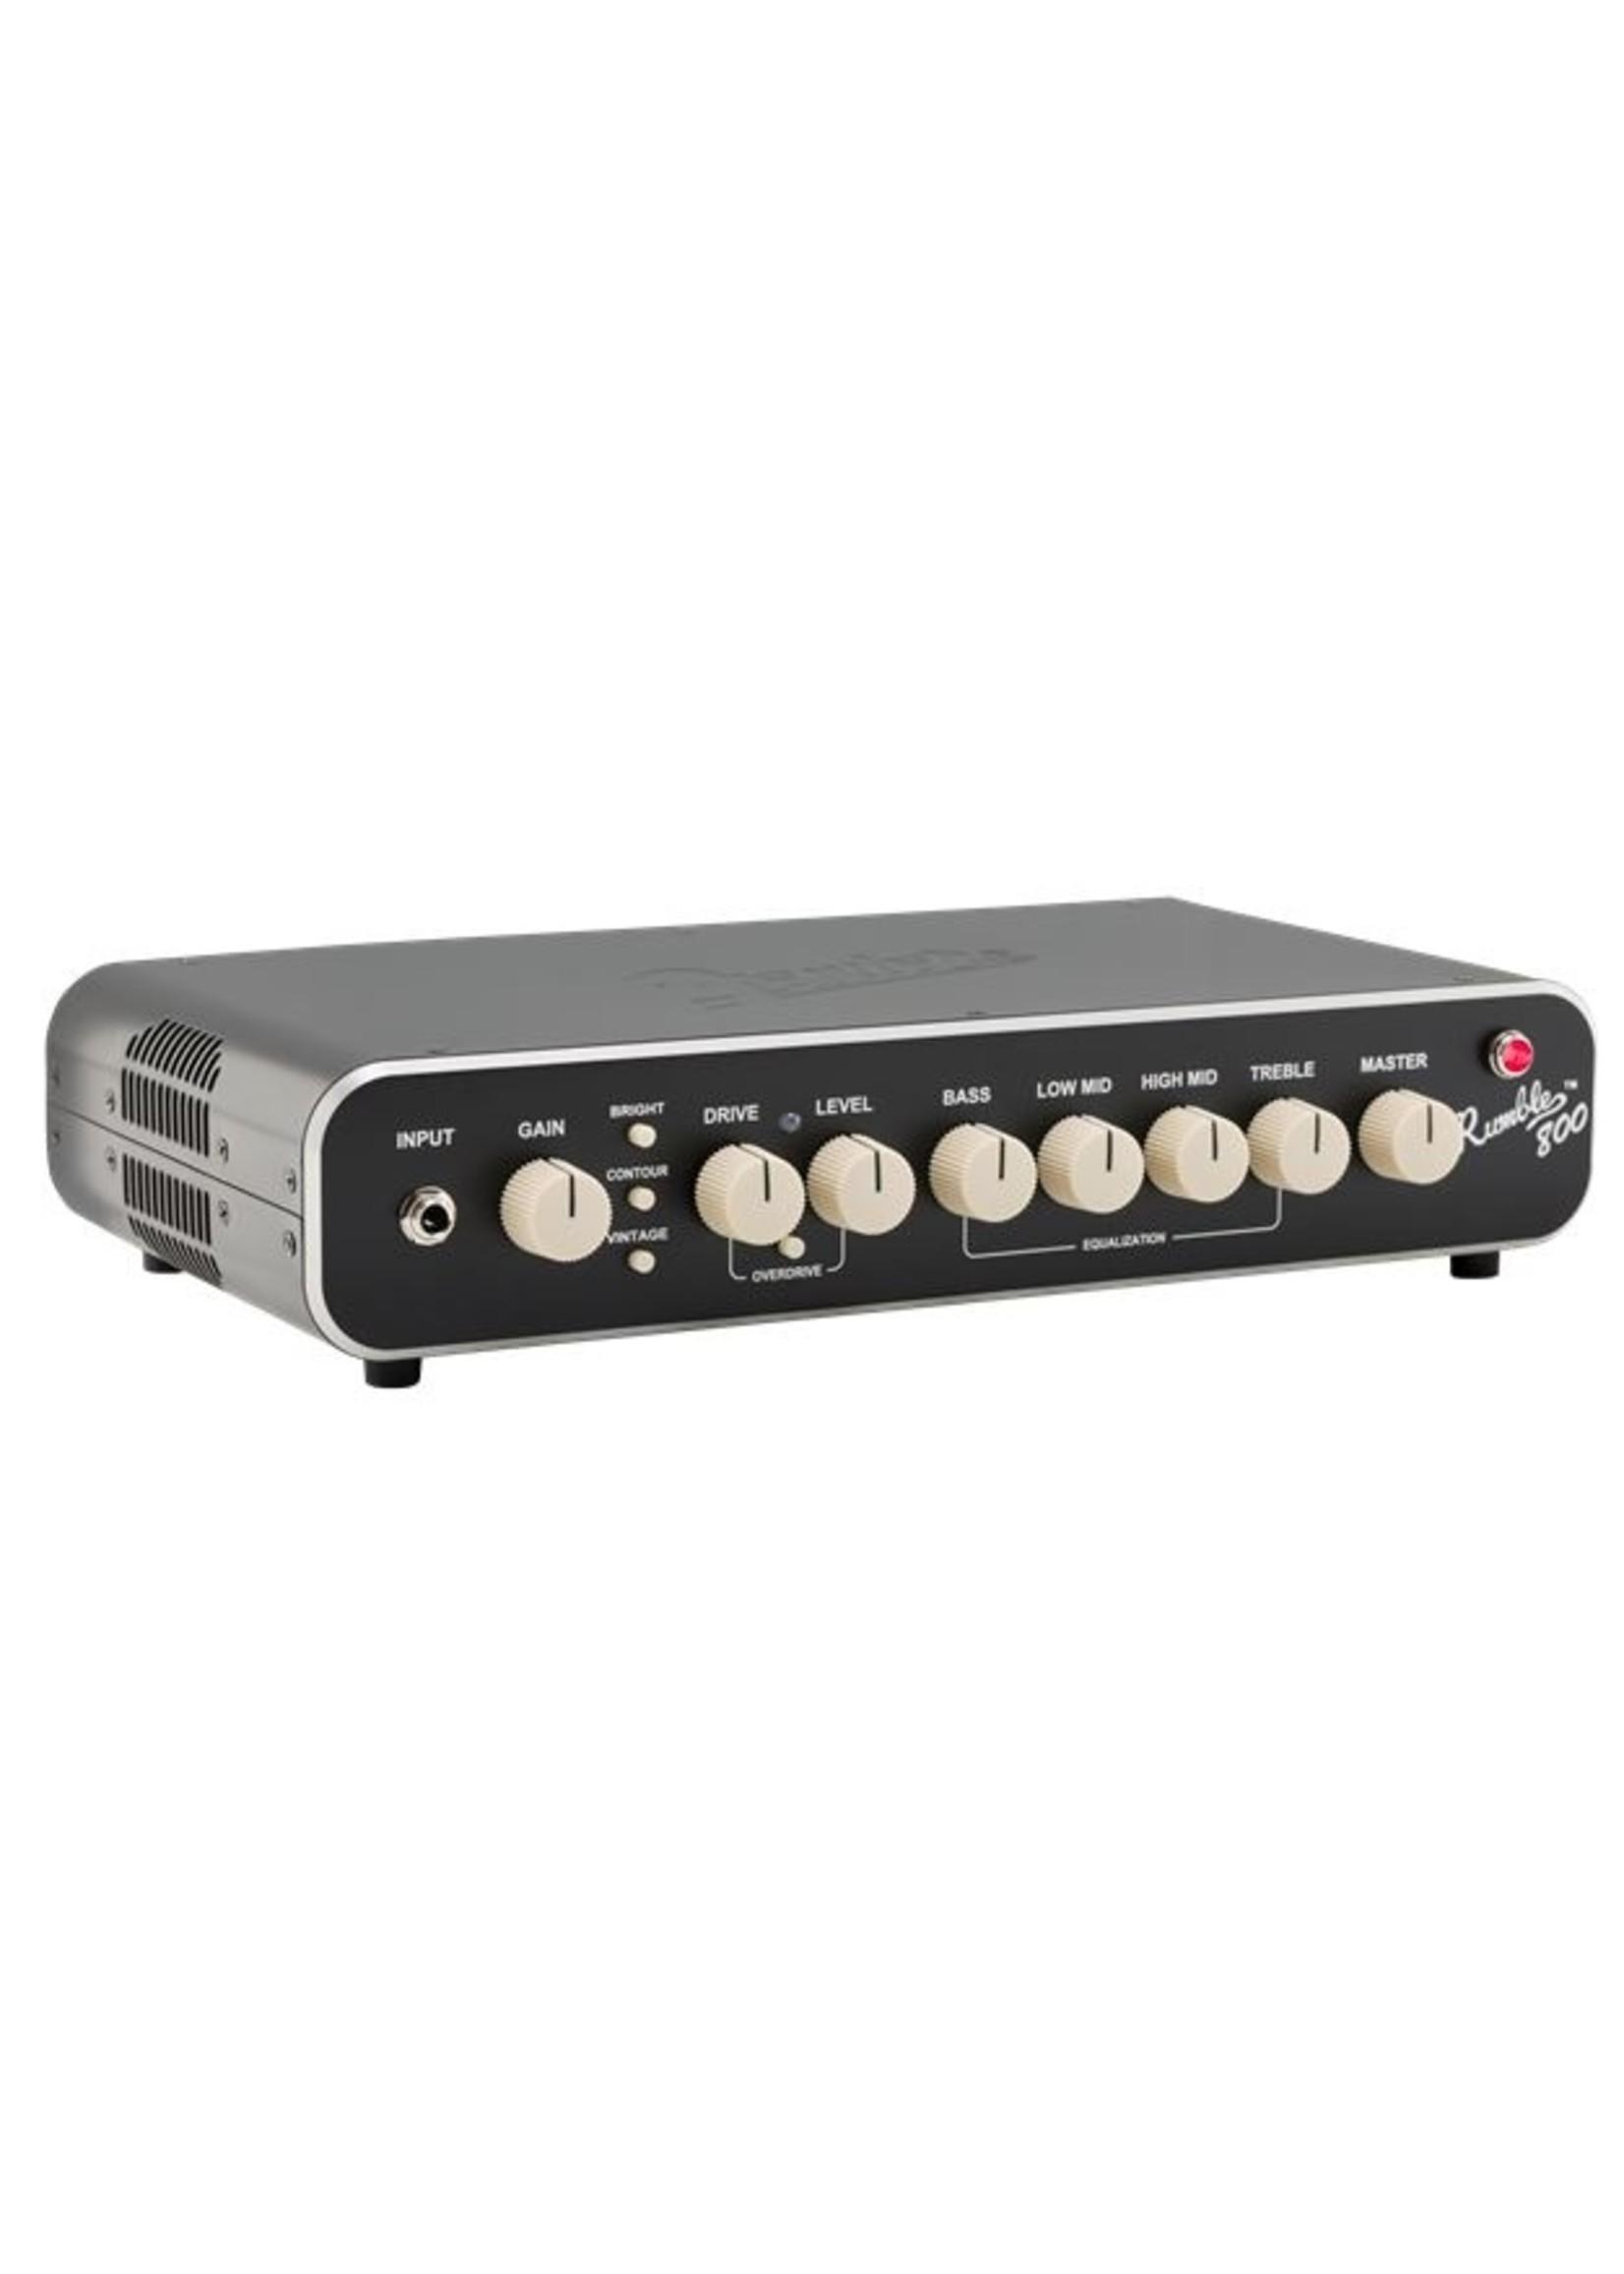 Fender Fender Rumble 800 HD Bass Amp Head Black